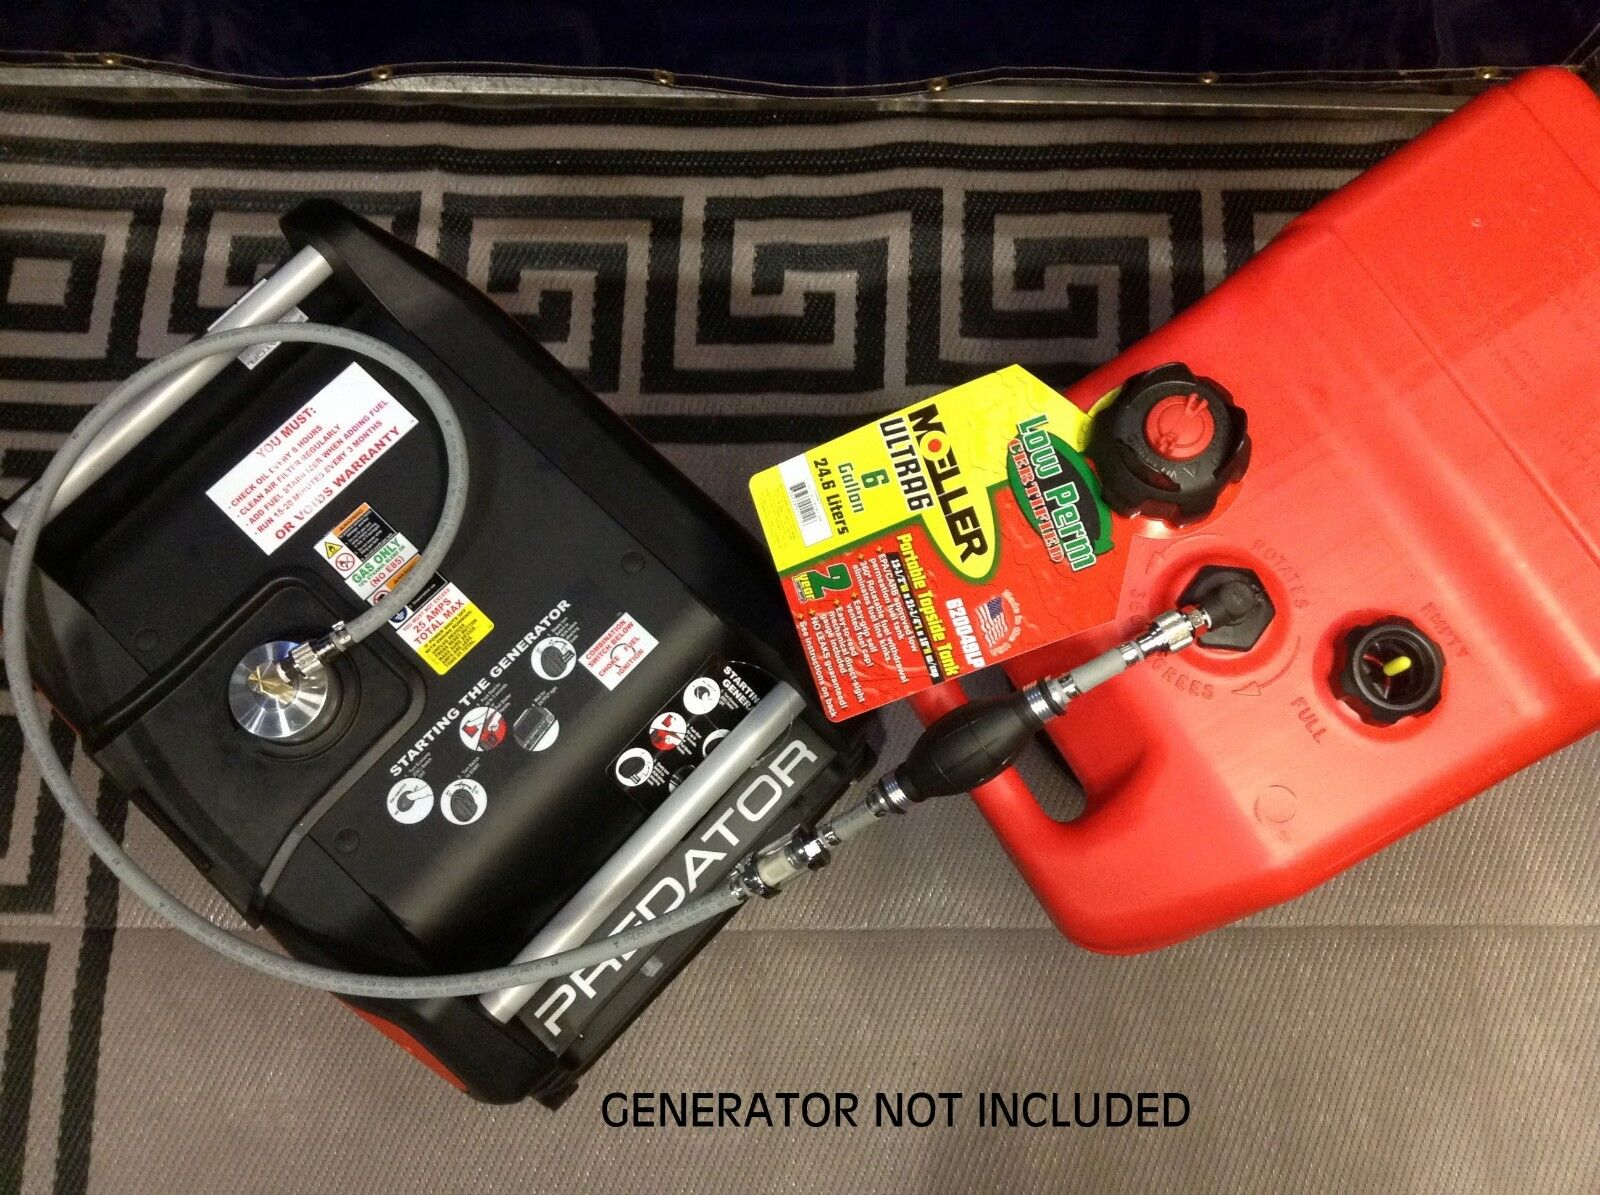 Generator Parts & Accessories PULSAR PG2000iS INVERTER GENERATOR ...